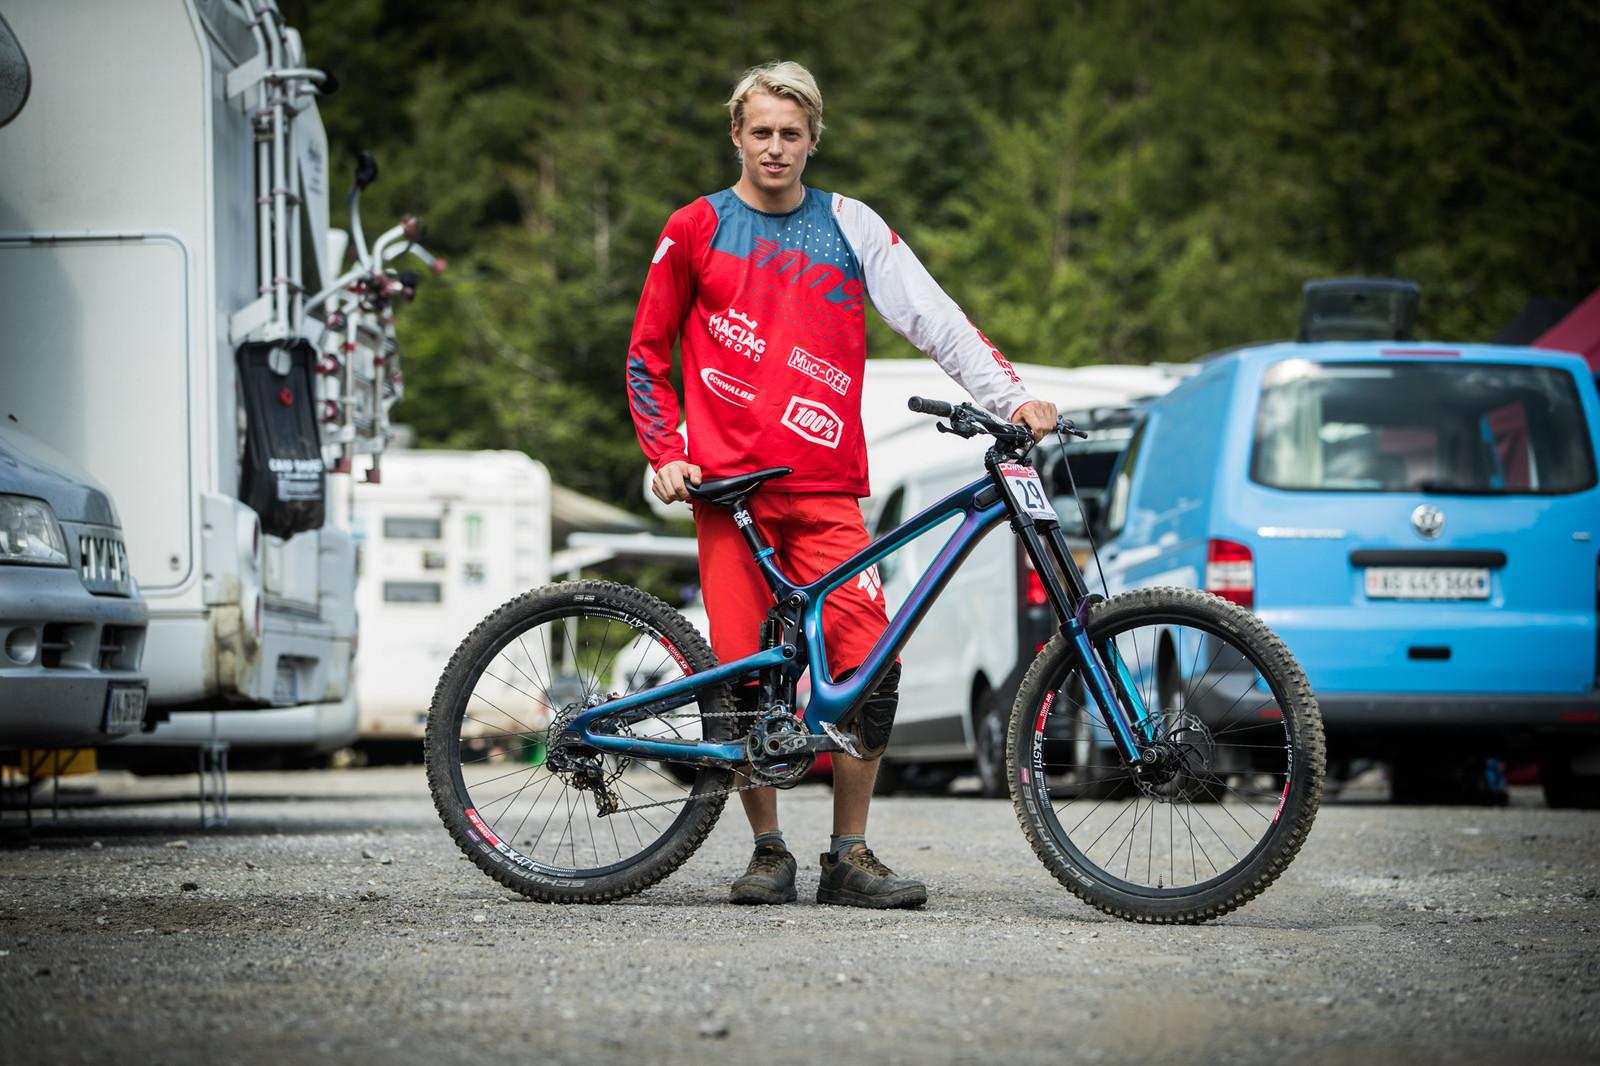 25 Downhill Bikes - iXS DH Cup #3 - Abetone - 25 Downhill Bikes - iXS DH Cup #3 - Abetone - Mountain Biking Pictures - Vital MTB